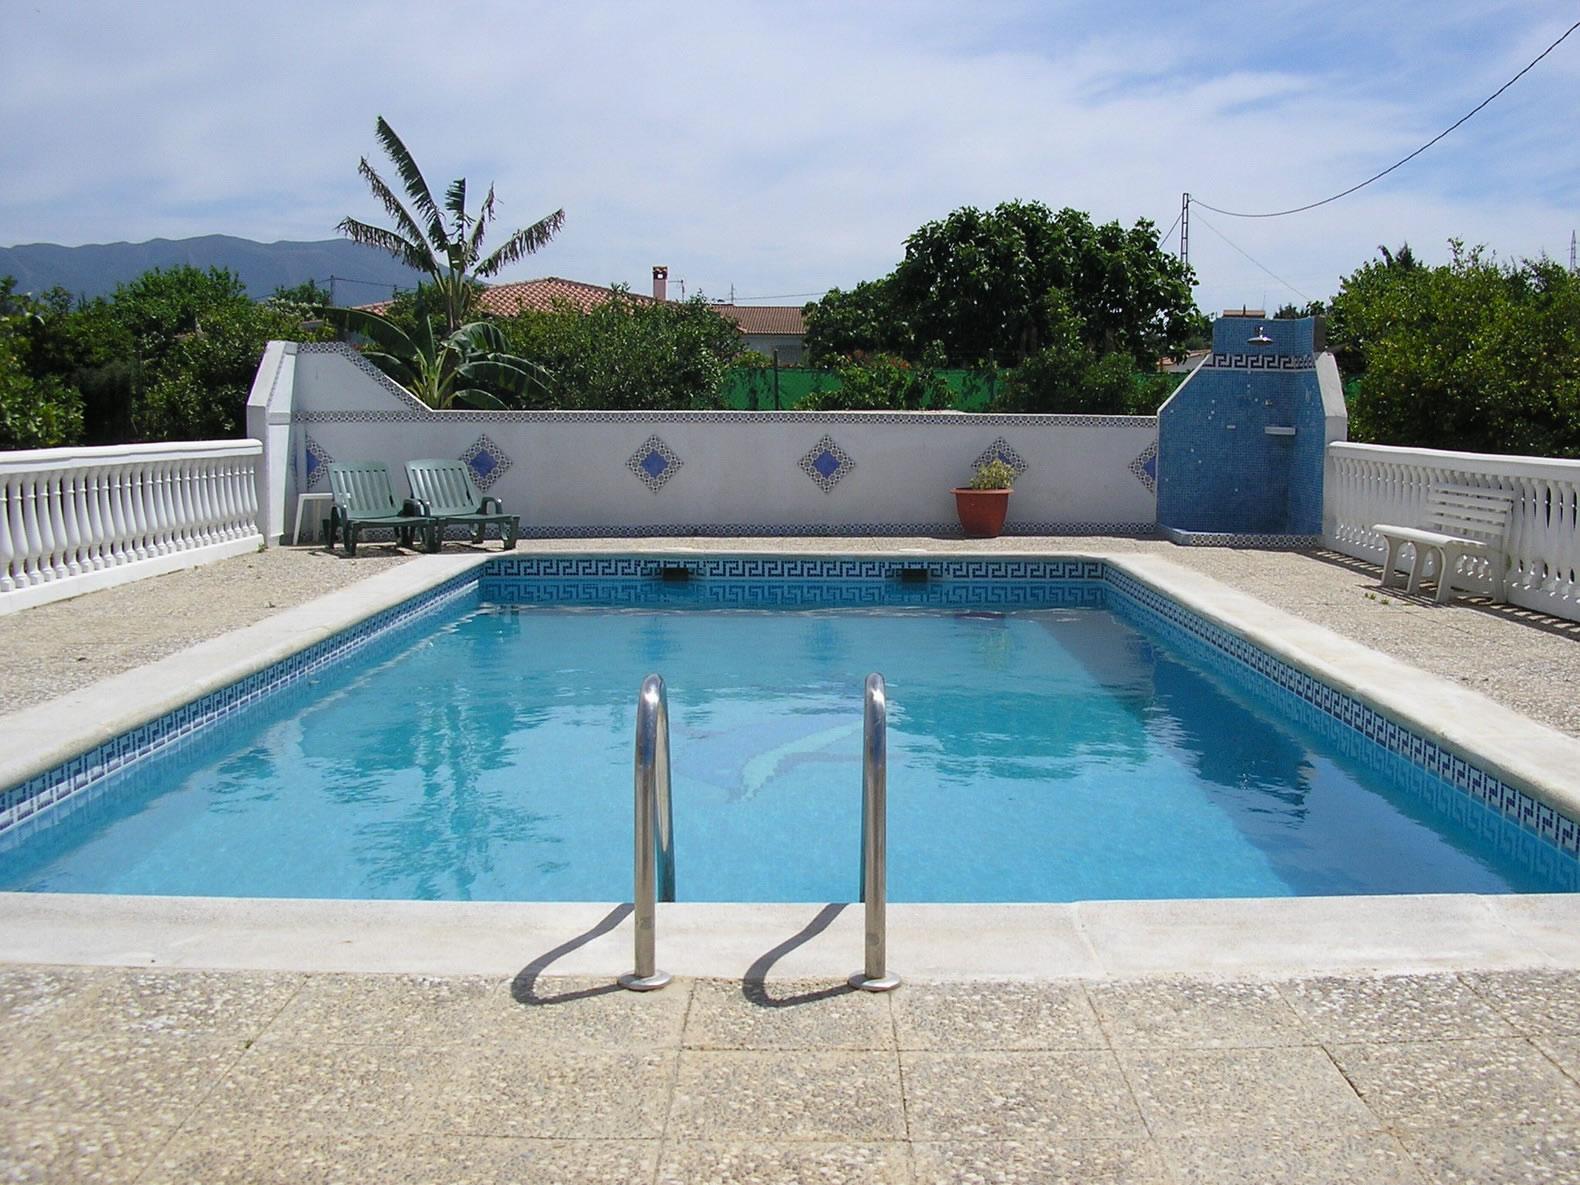 Mantenimiento de piscinas - Piscinas para casas ...